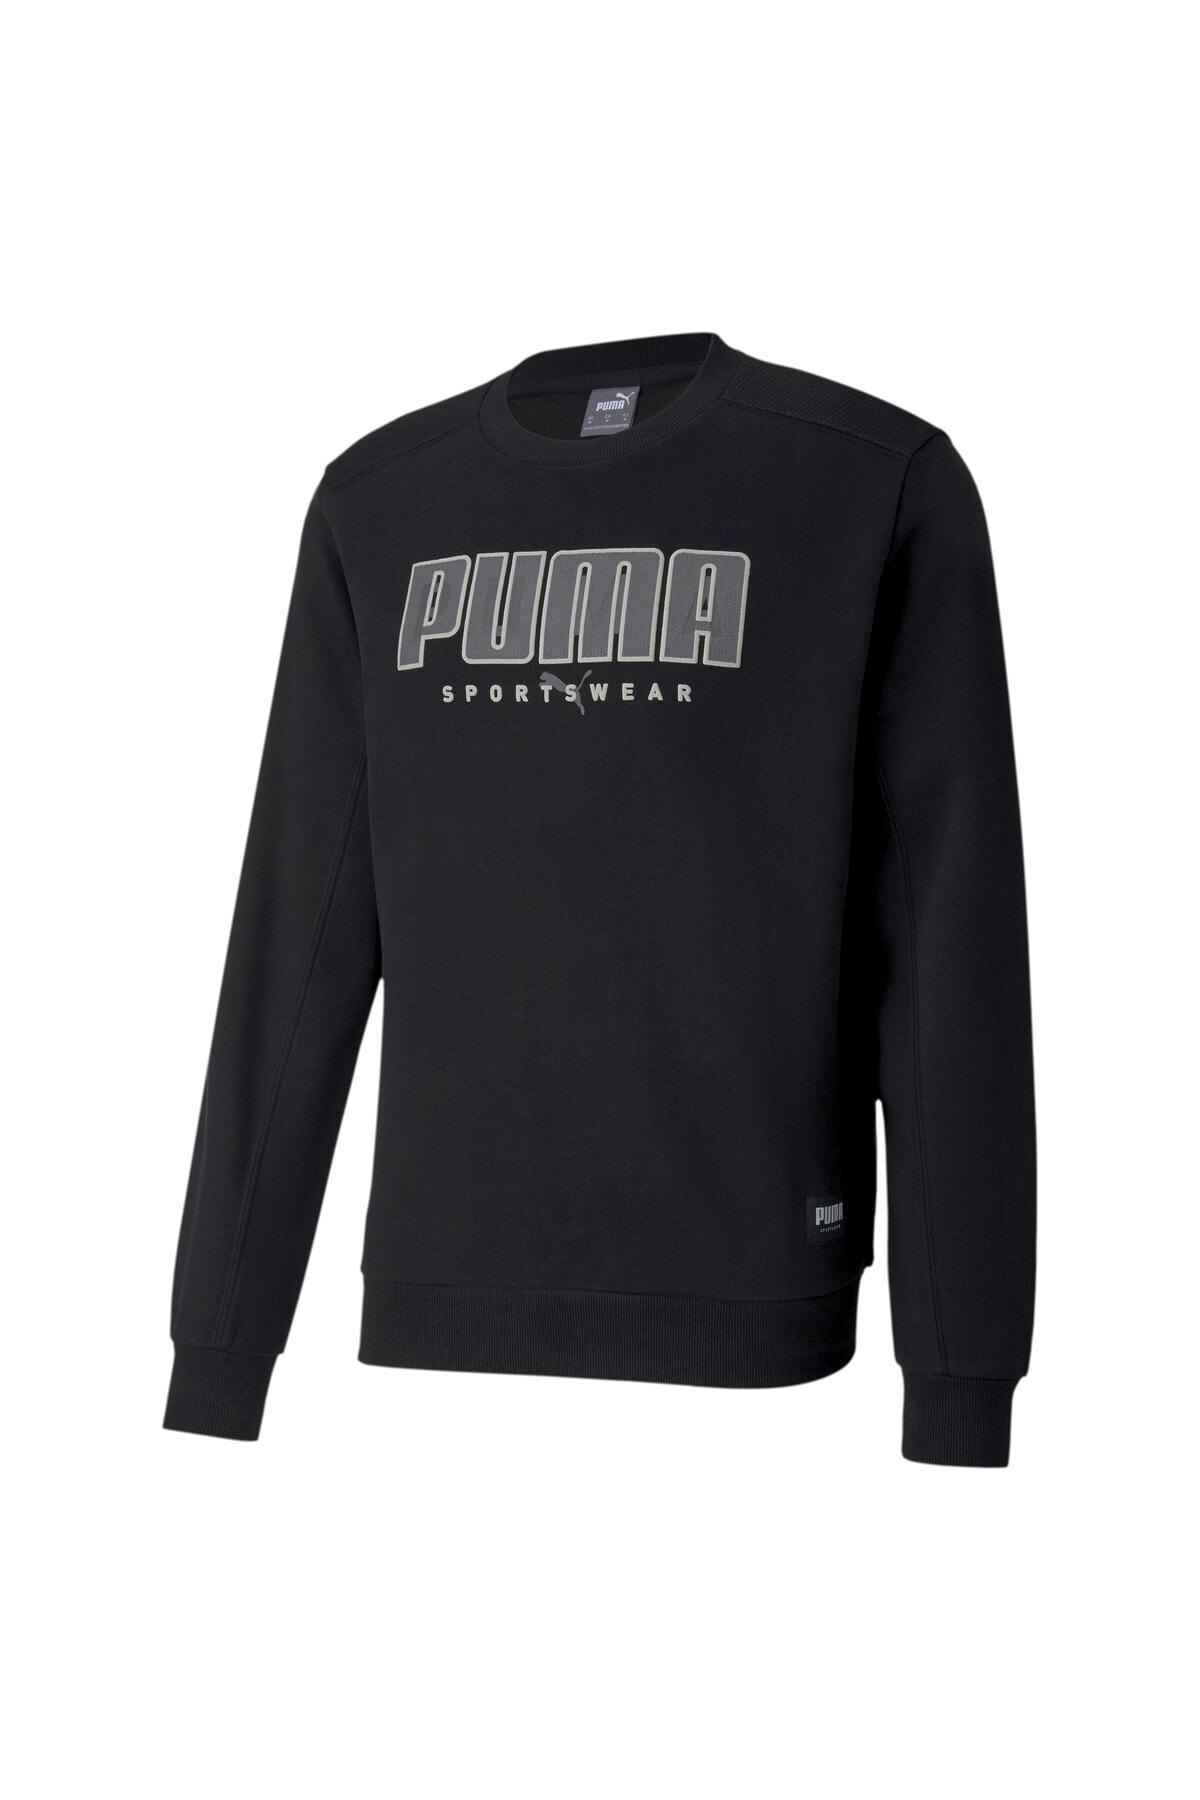 Puma ATHLETICS CREW FL Siyah Erkek Sweatshirt 101119420